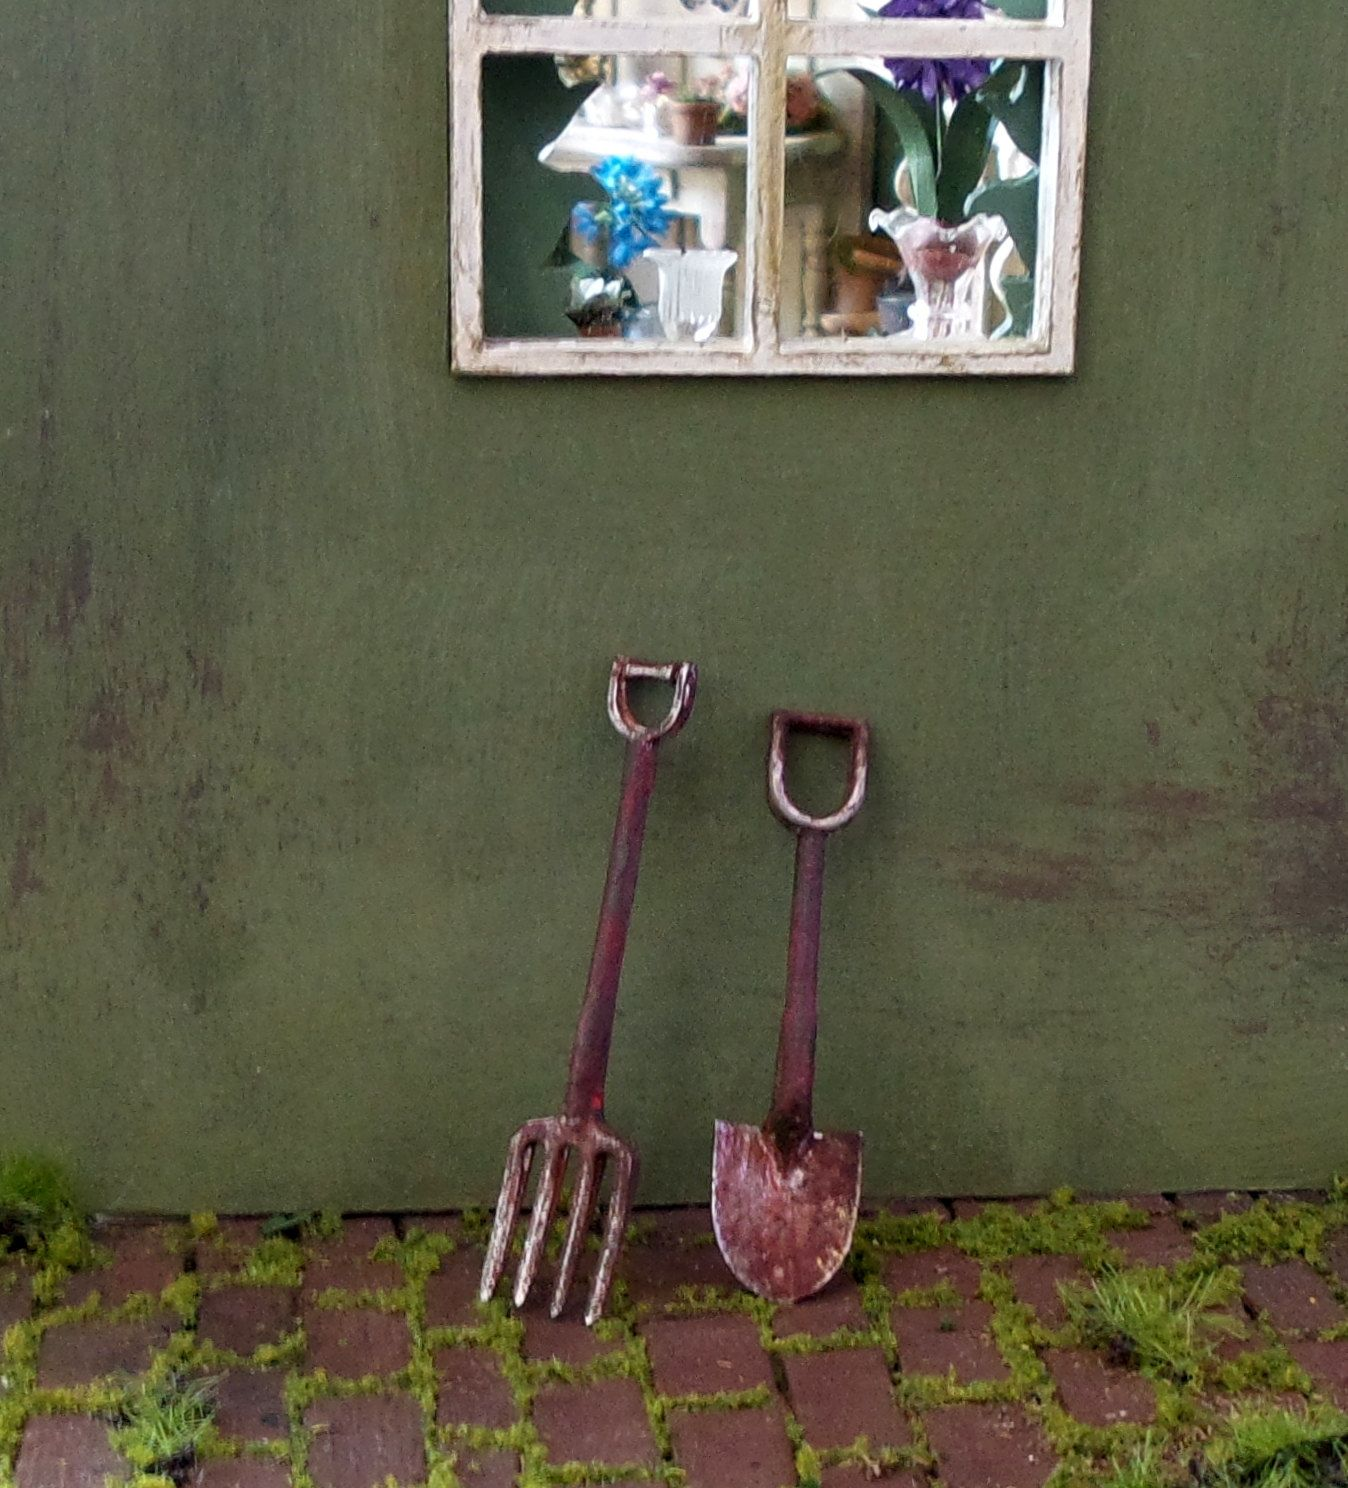 Miniature Tool Scale 1: 12 Dolls House Garden Shovel Spade